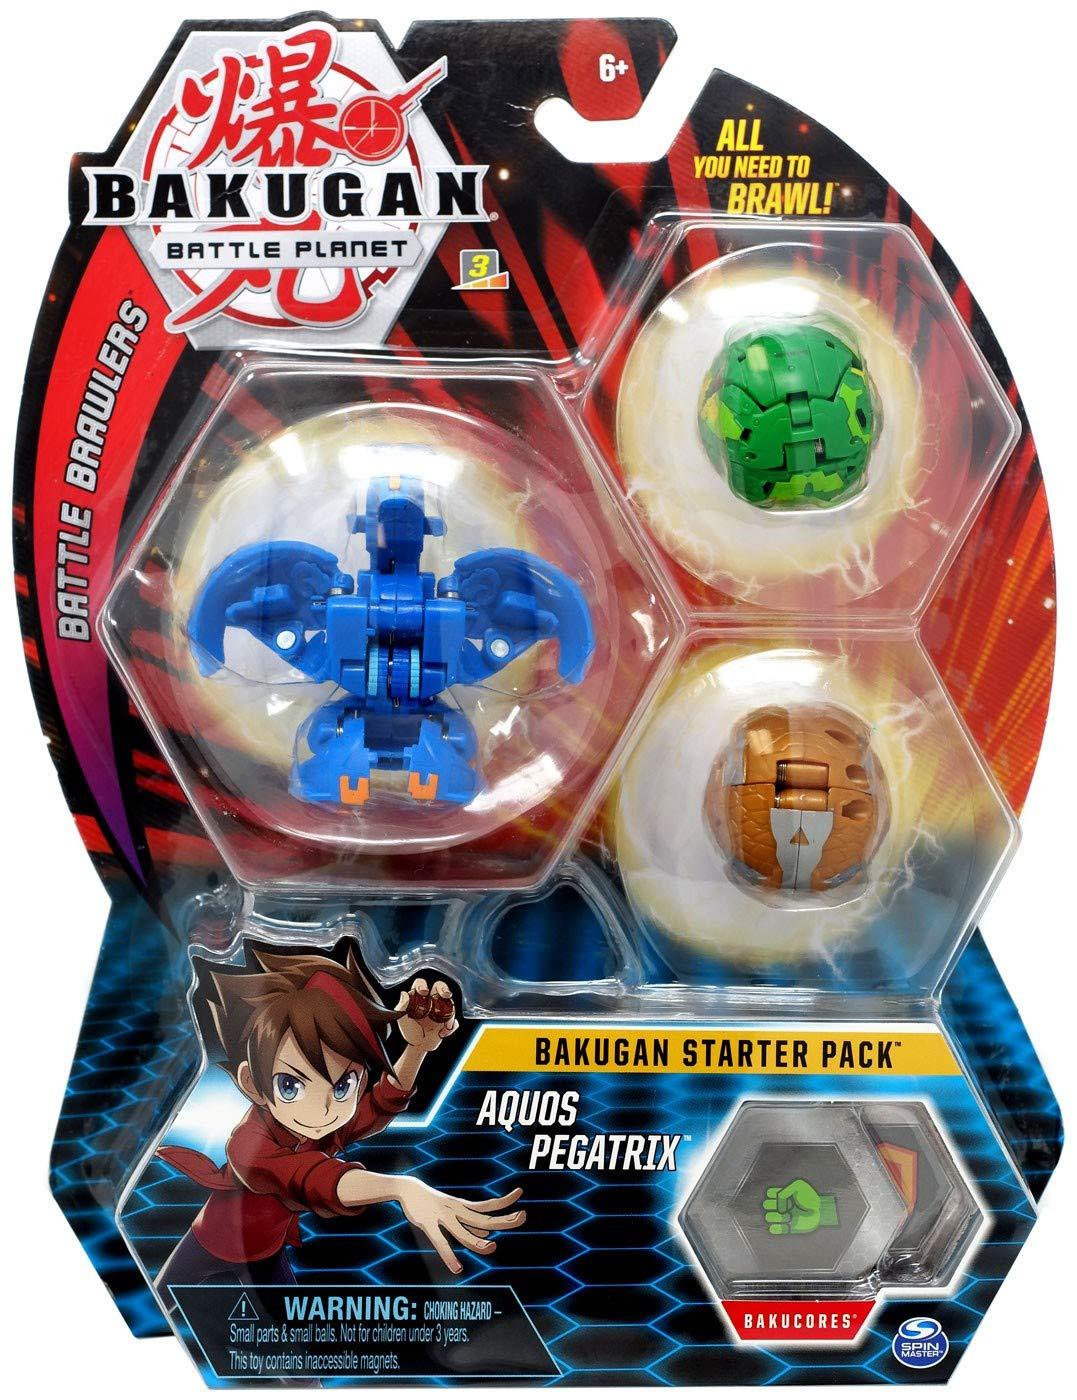 BAKUGAN Starter Pack - Pack Aquos Pegatrix: Amazon.es: Juguetes y ...